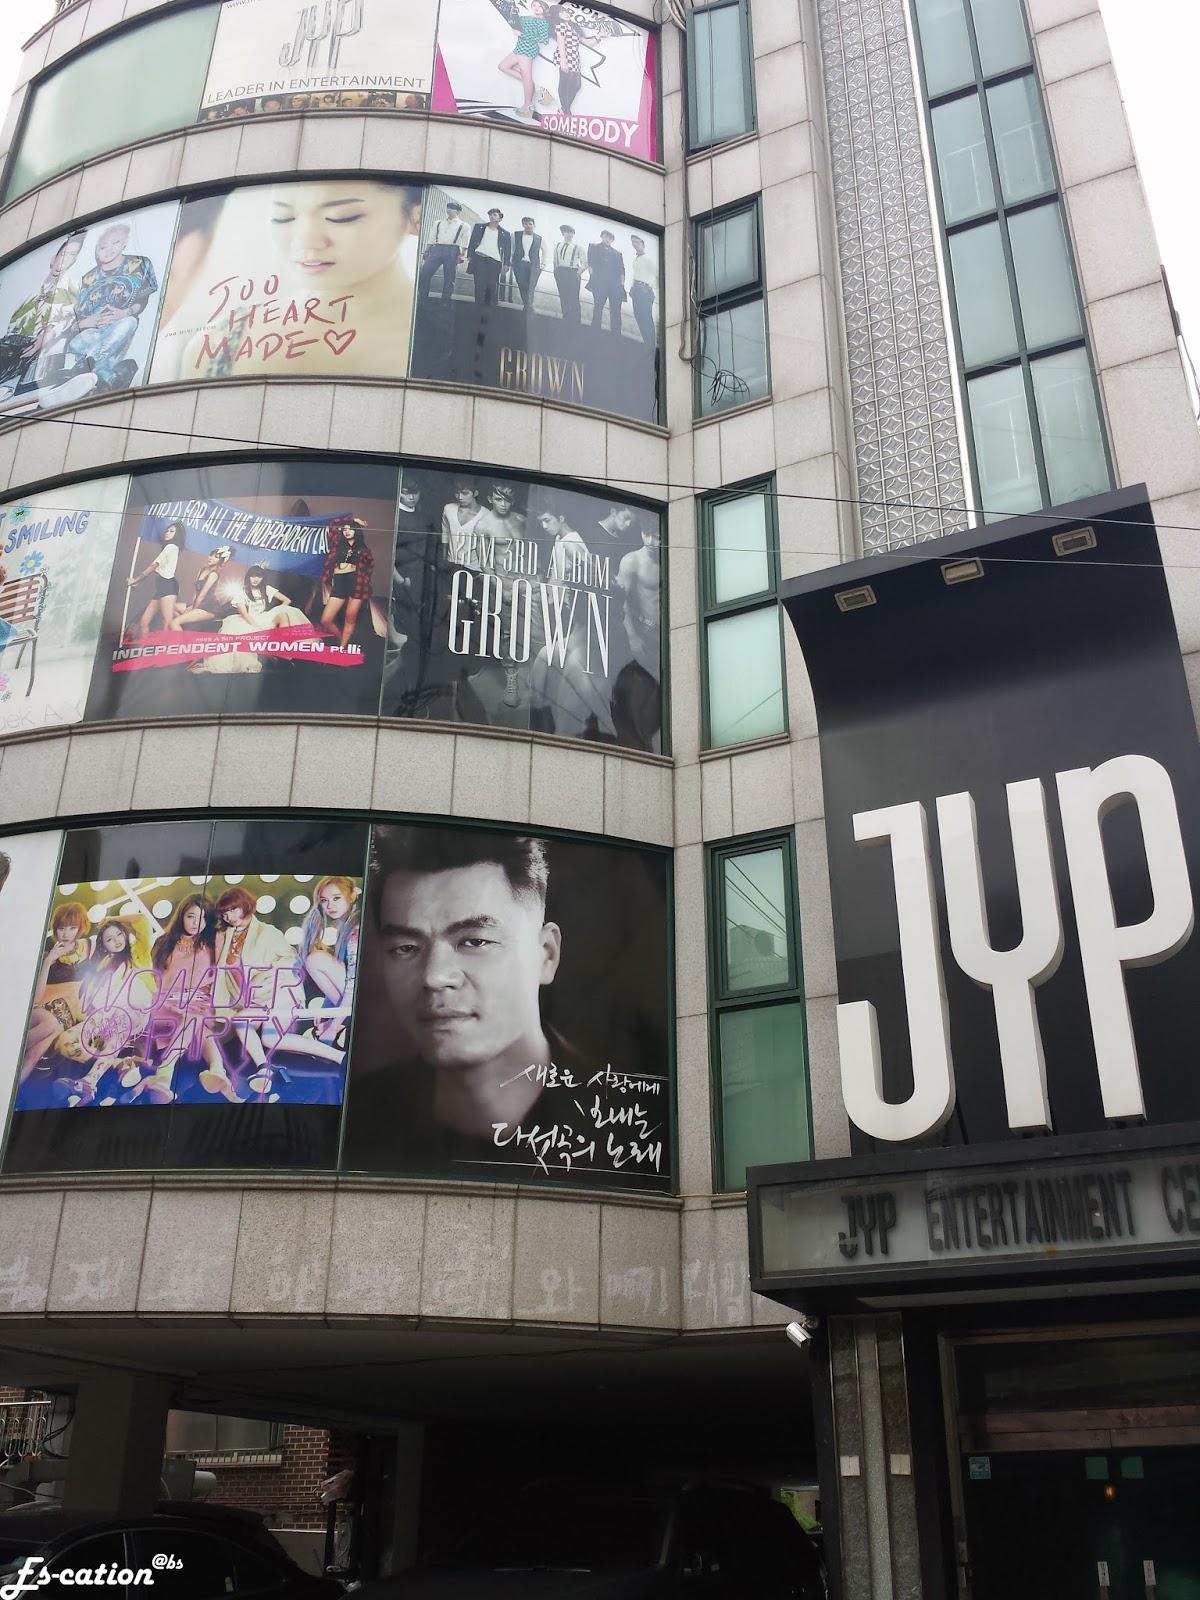 es-cation: Seoul - JYP Entertainment